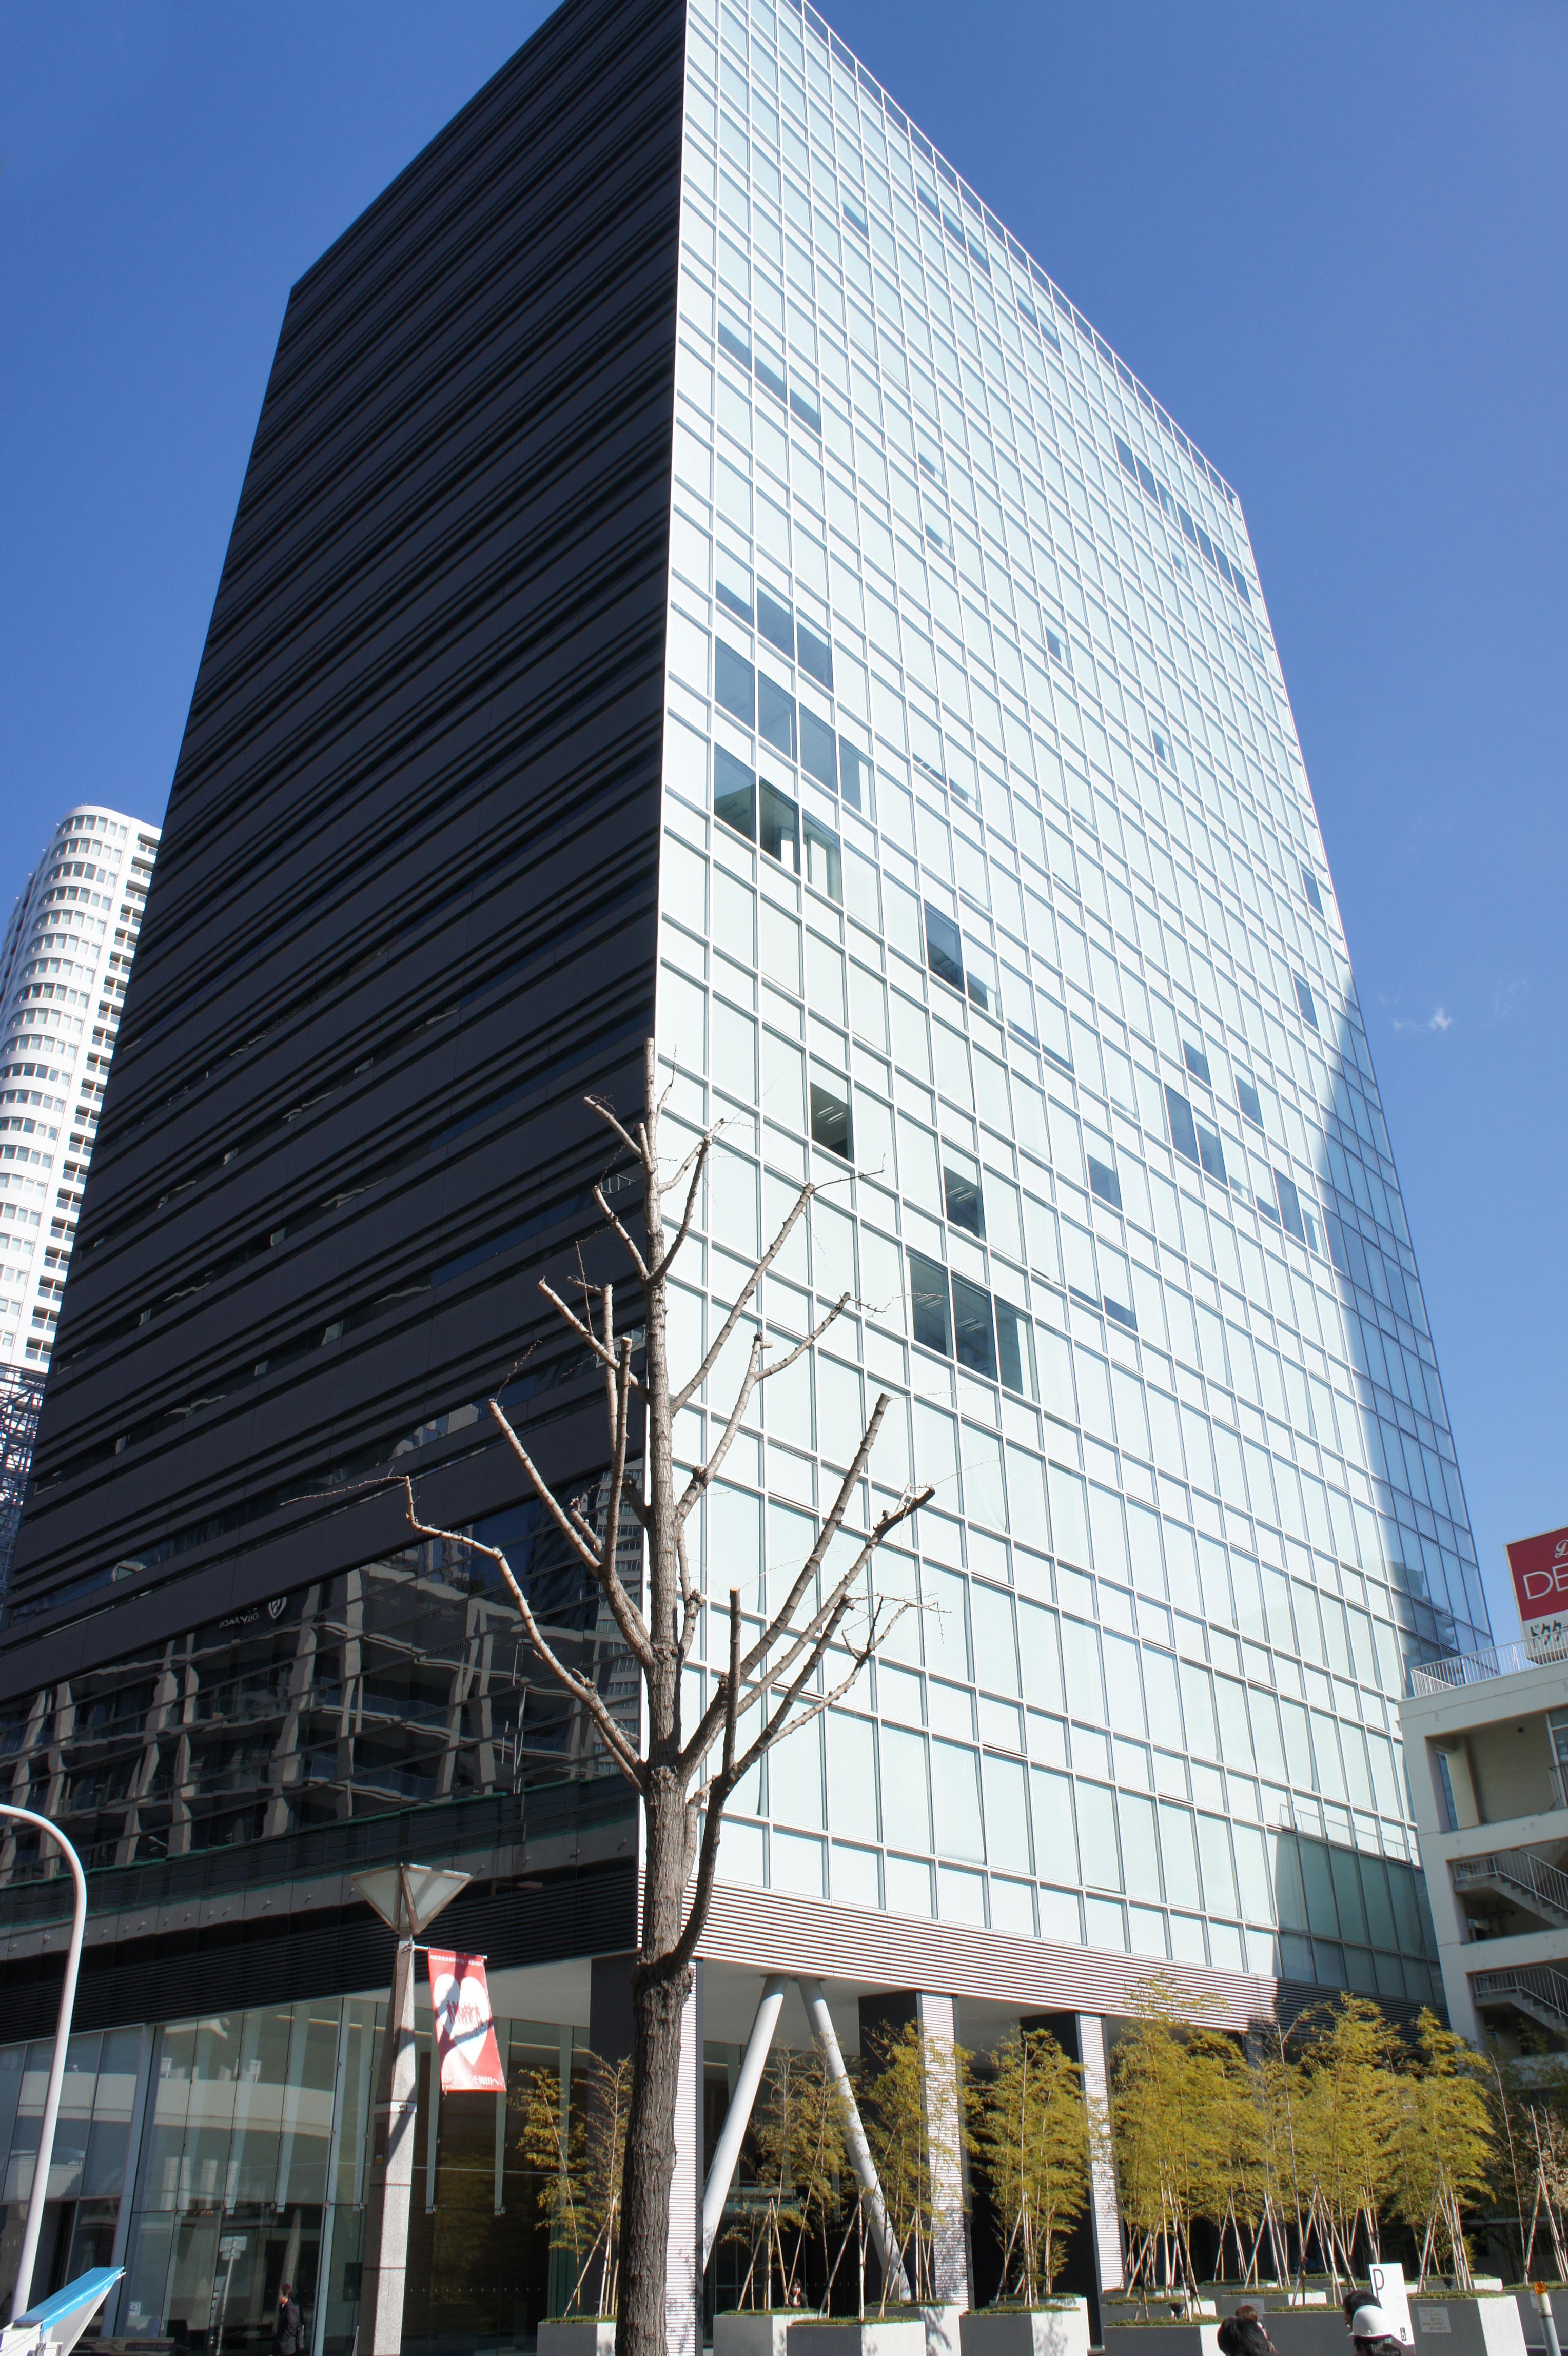 <b>梅田ゲートタワー</b> - Wikipedia